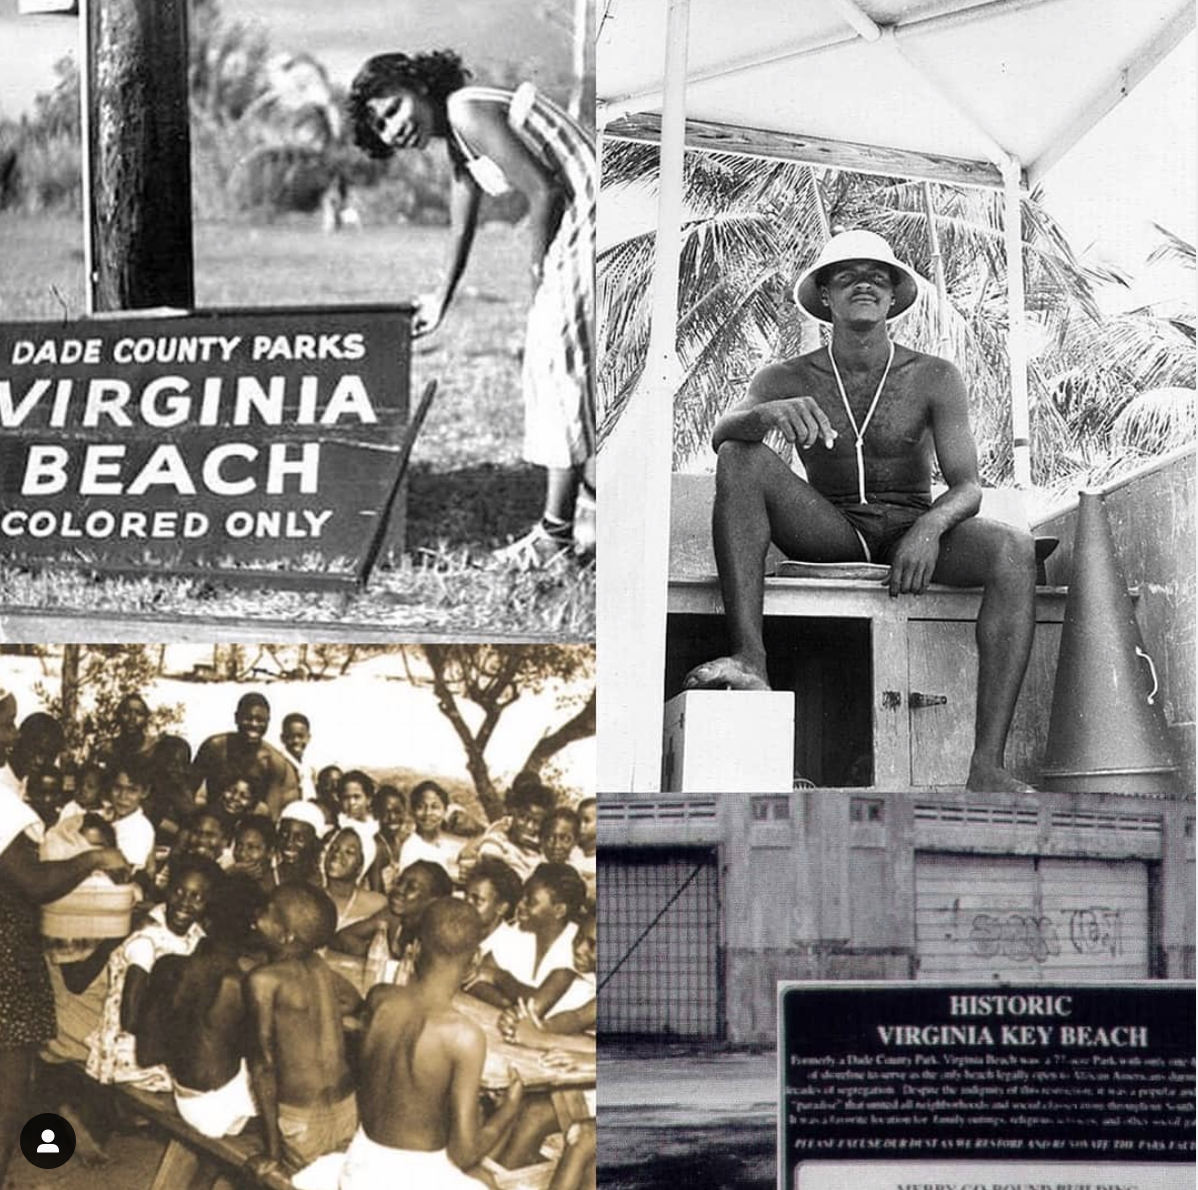 Historic Virginia Key Beach collage